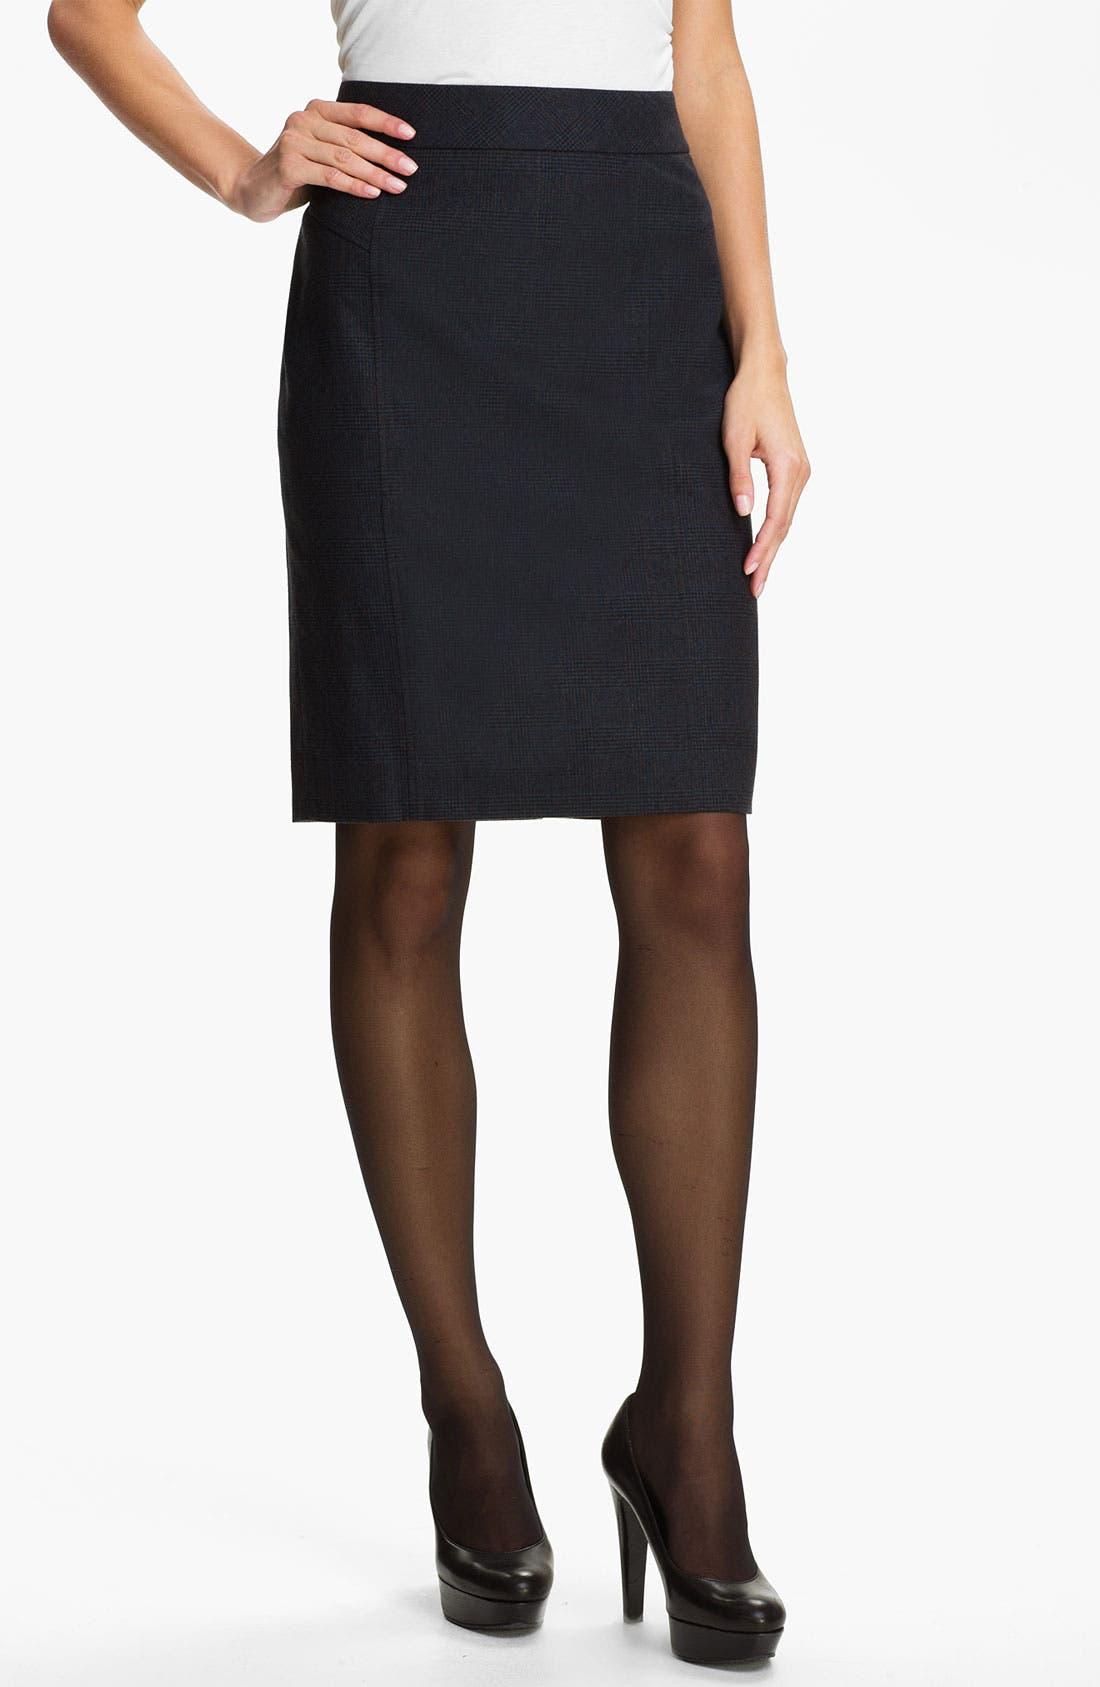 Alternate Image 1 Selected - Classiques Entier® 'Adima Check' Skirt